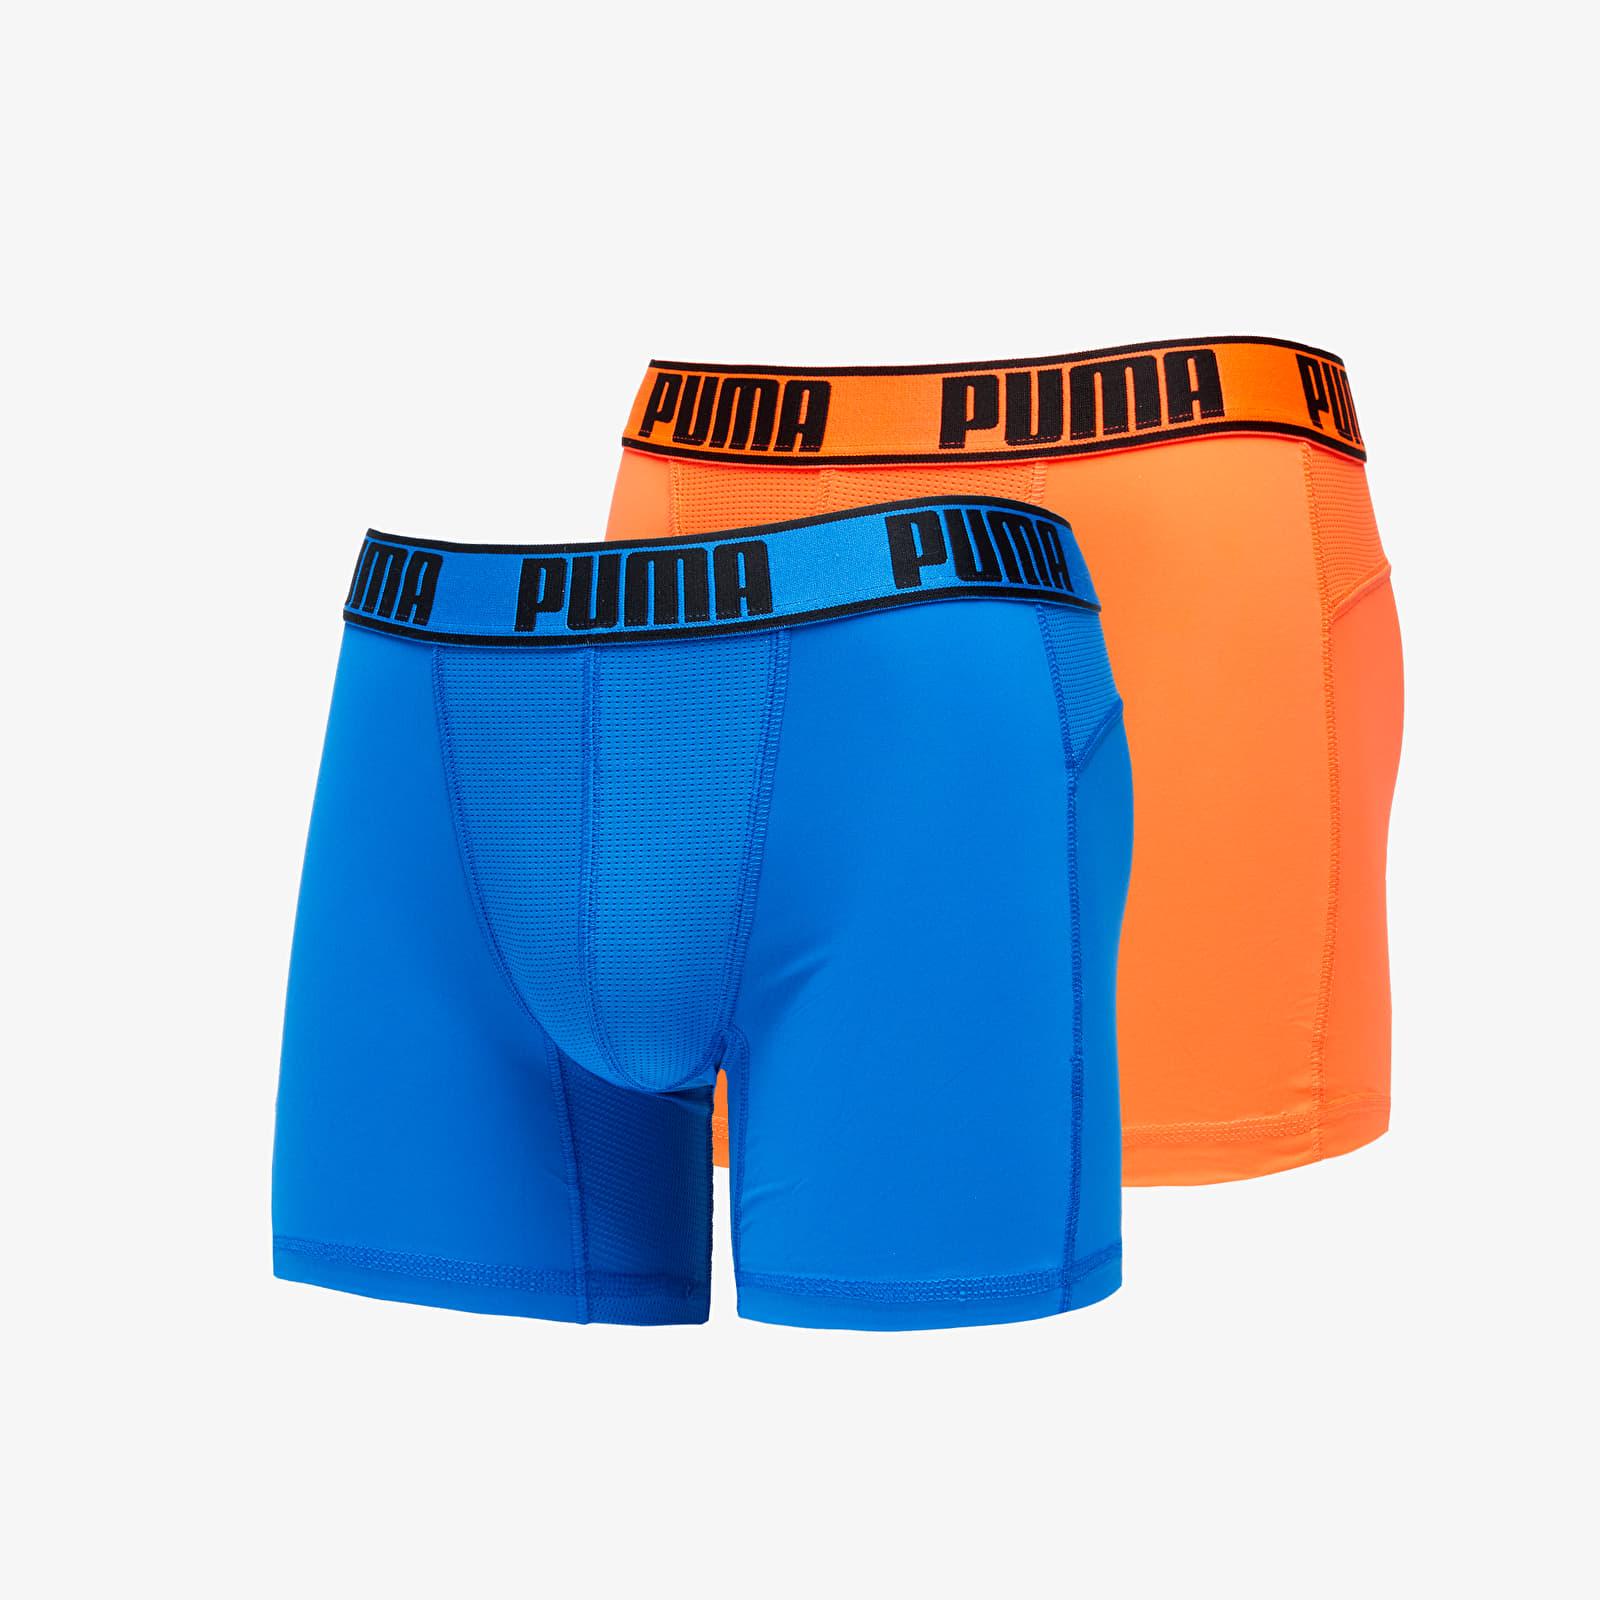 Puma 2 Pack Active Boxers Packed Blue/ Orange   Footshop